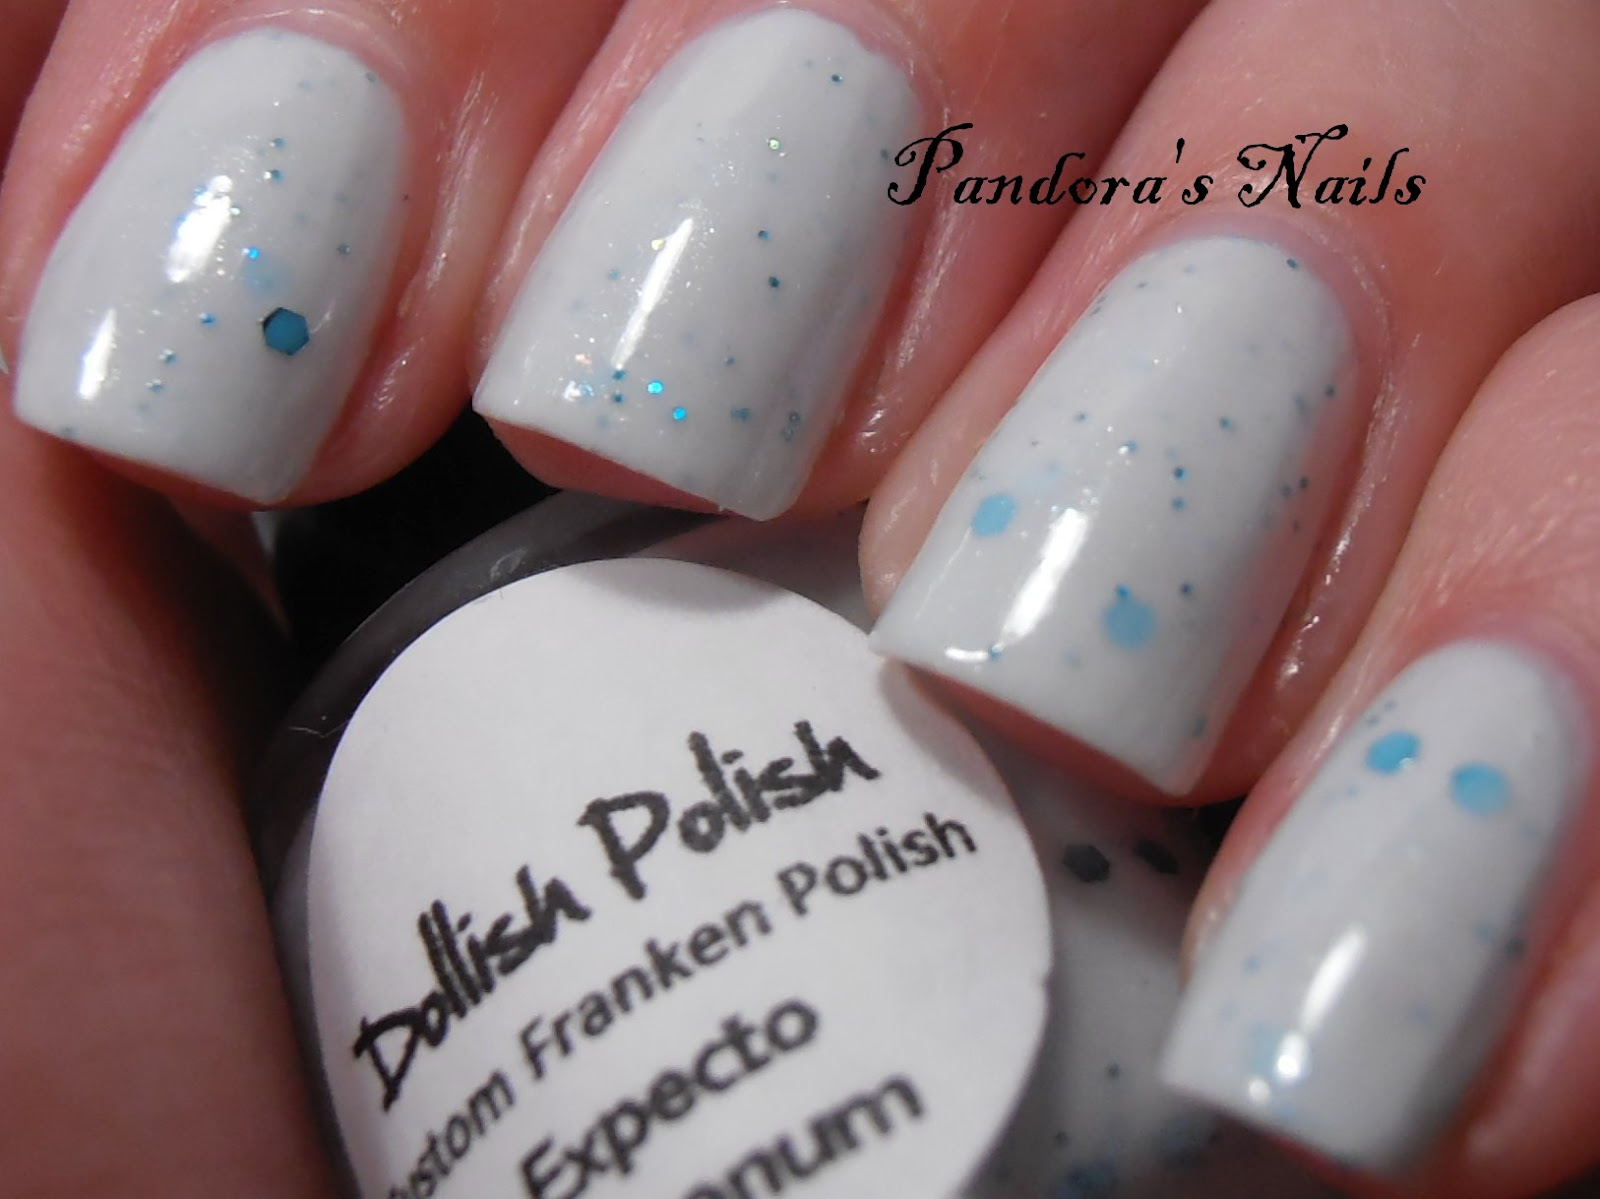 http://1.bp.blogspot.com/-LvhXbIe1qDA/T8H6odBi2hI/AAAAAAAACN8/NH-H6Rp8tu8/s1600/dollish+polish+expecto+patronum+3.JPG